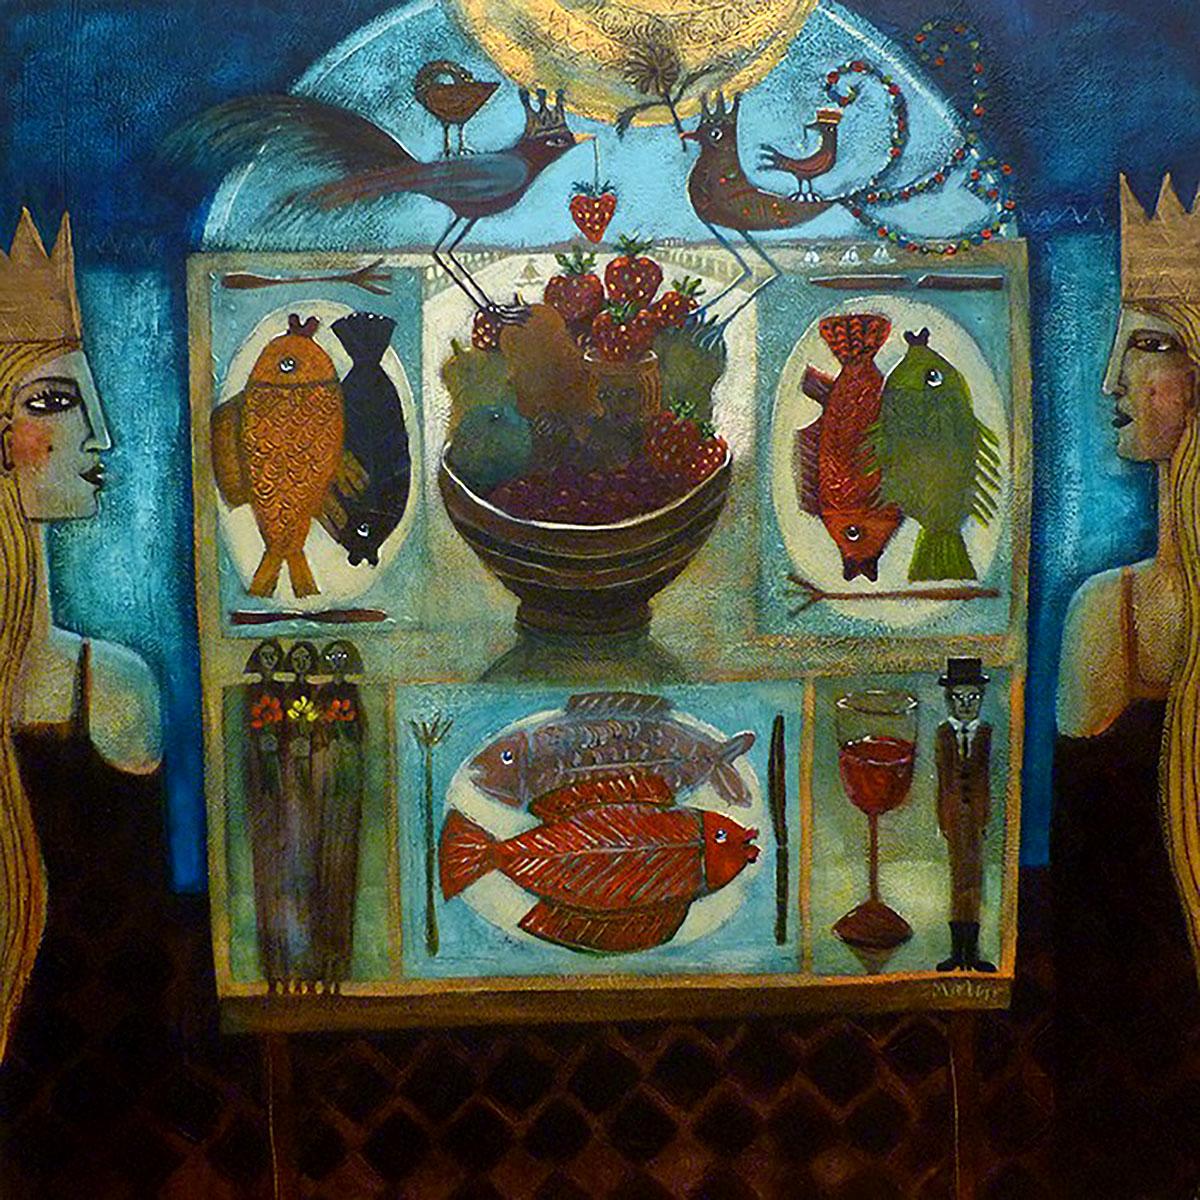 Morag Muir, 'The Window Table', acrylic on board